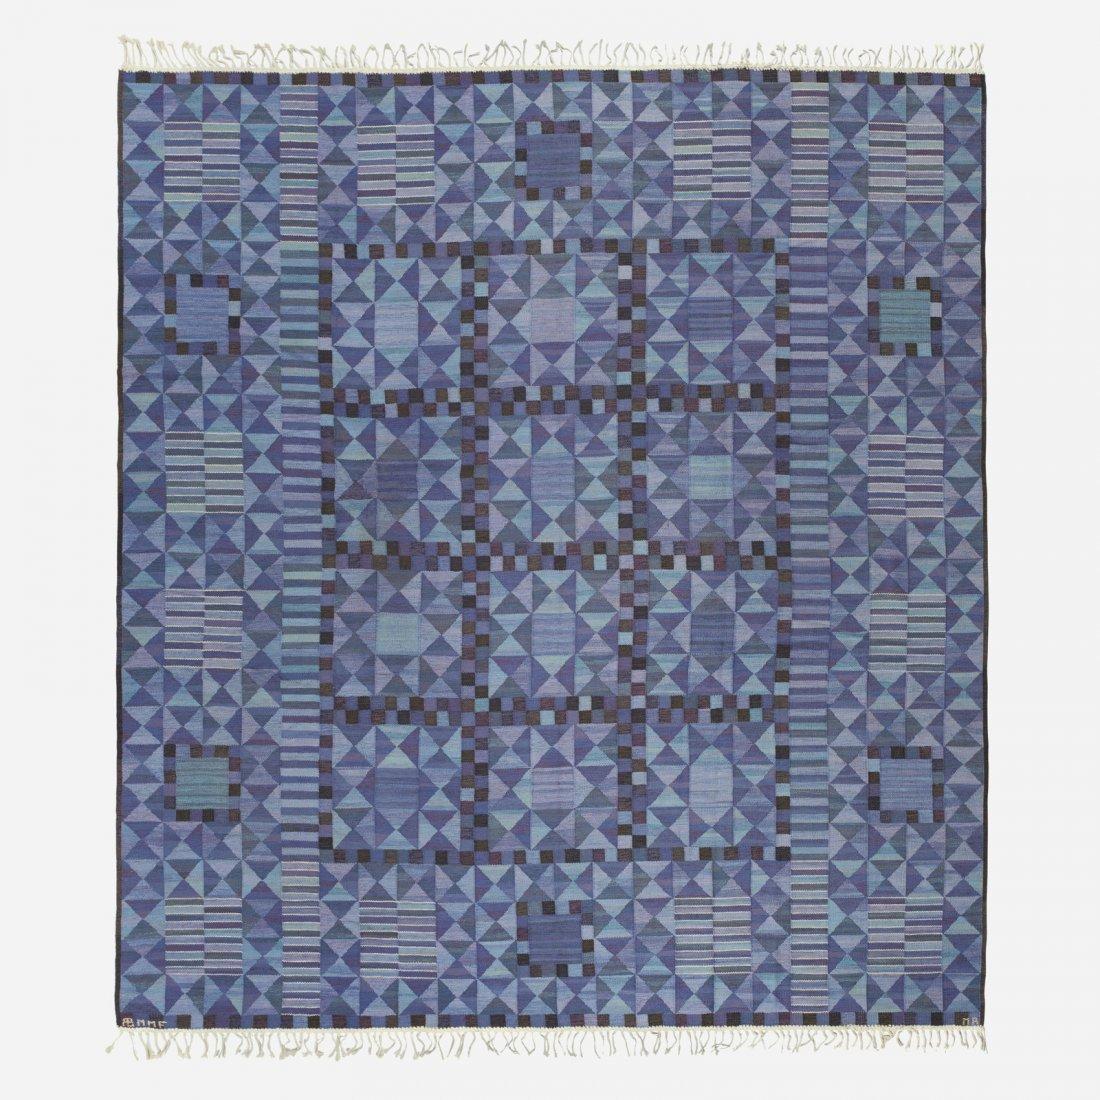 Marianne Richter, Rubirosa flatweave carpet